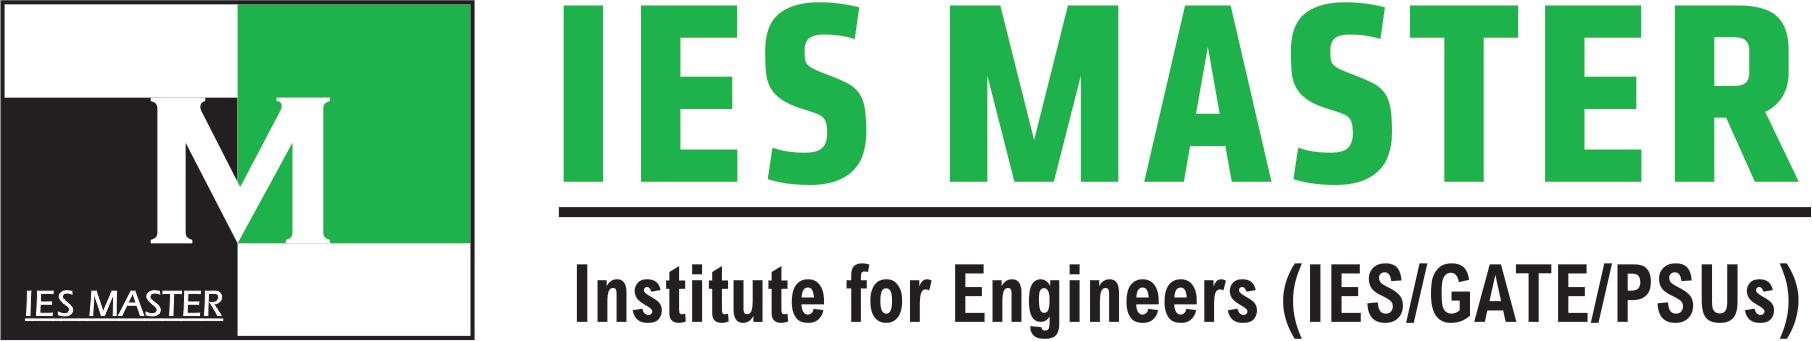 IESMaster01 Logo